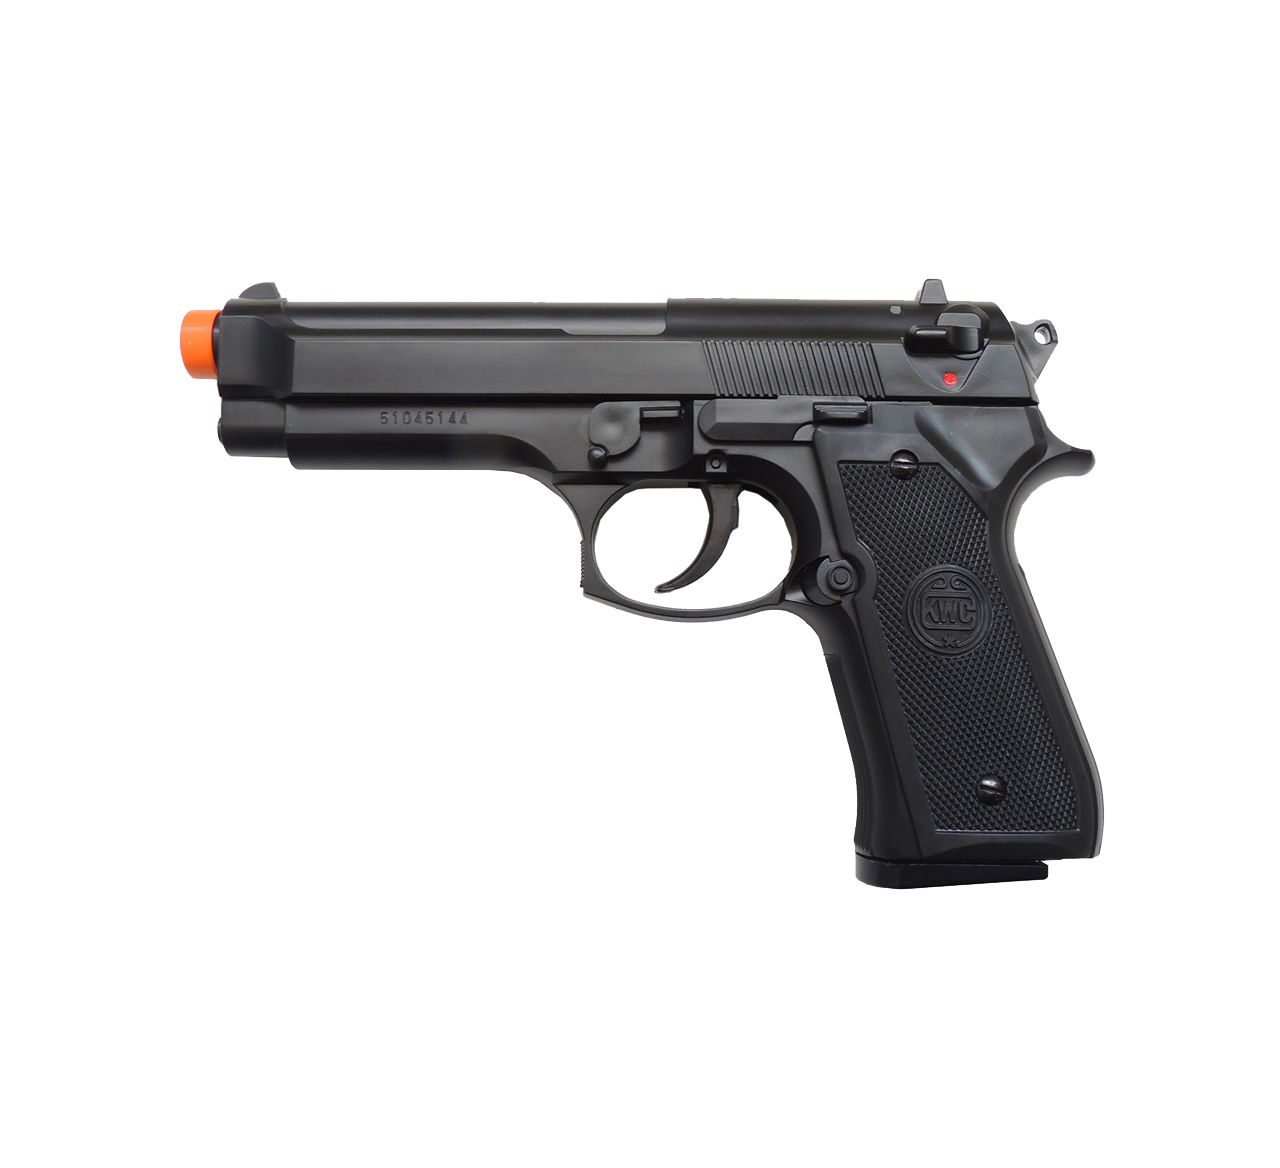 Pistola Airsoft KWC M92 Spring